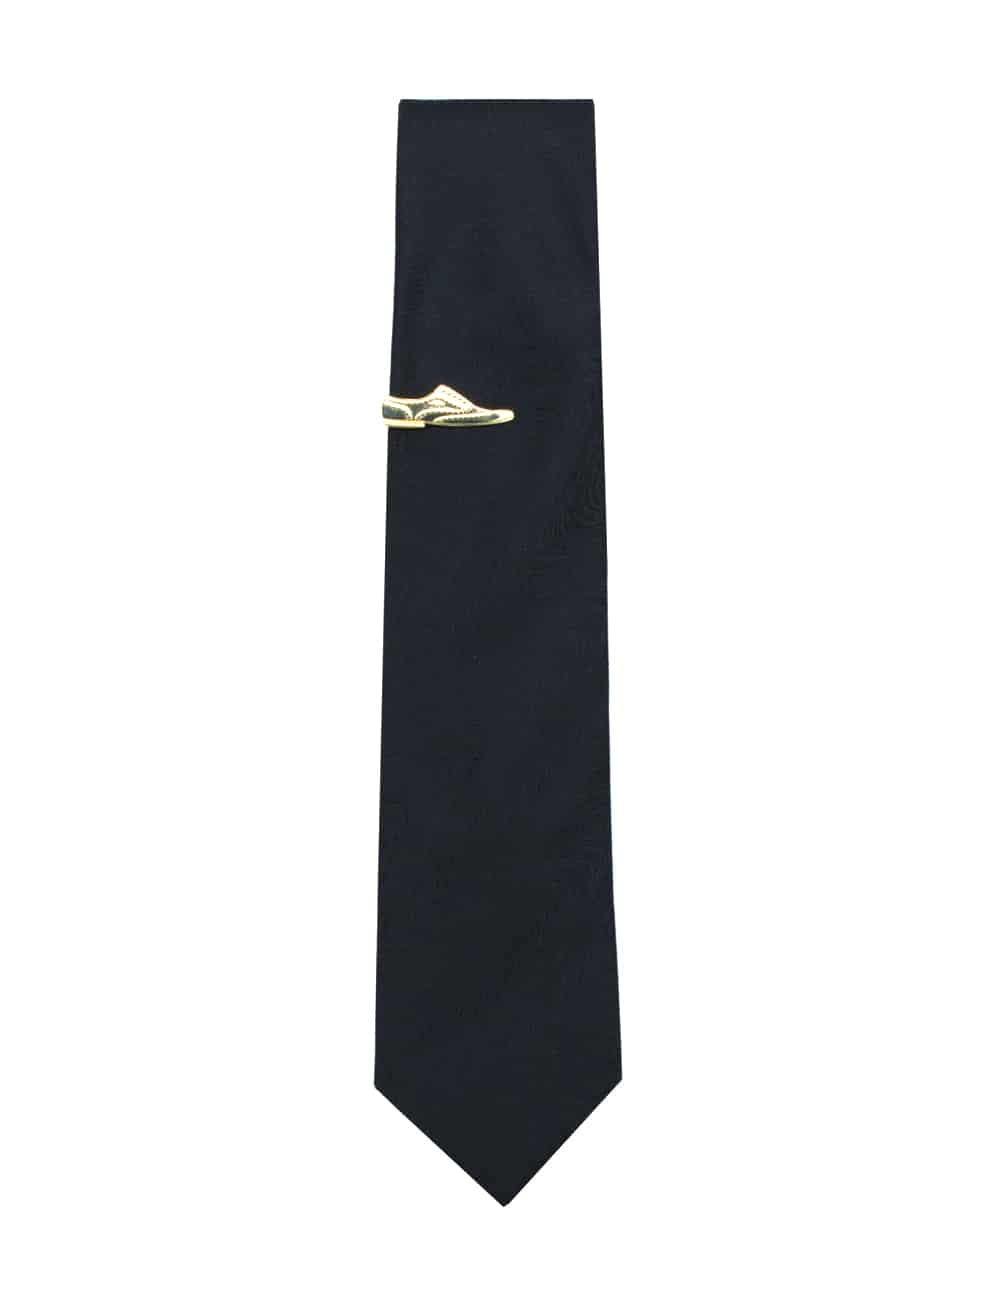 Gold Wingtip Shoe Tie Clip